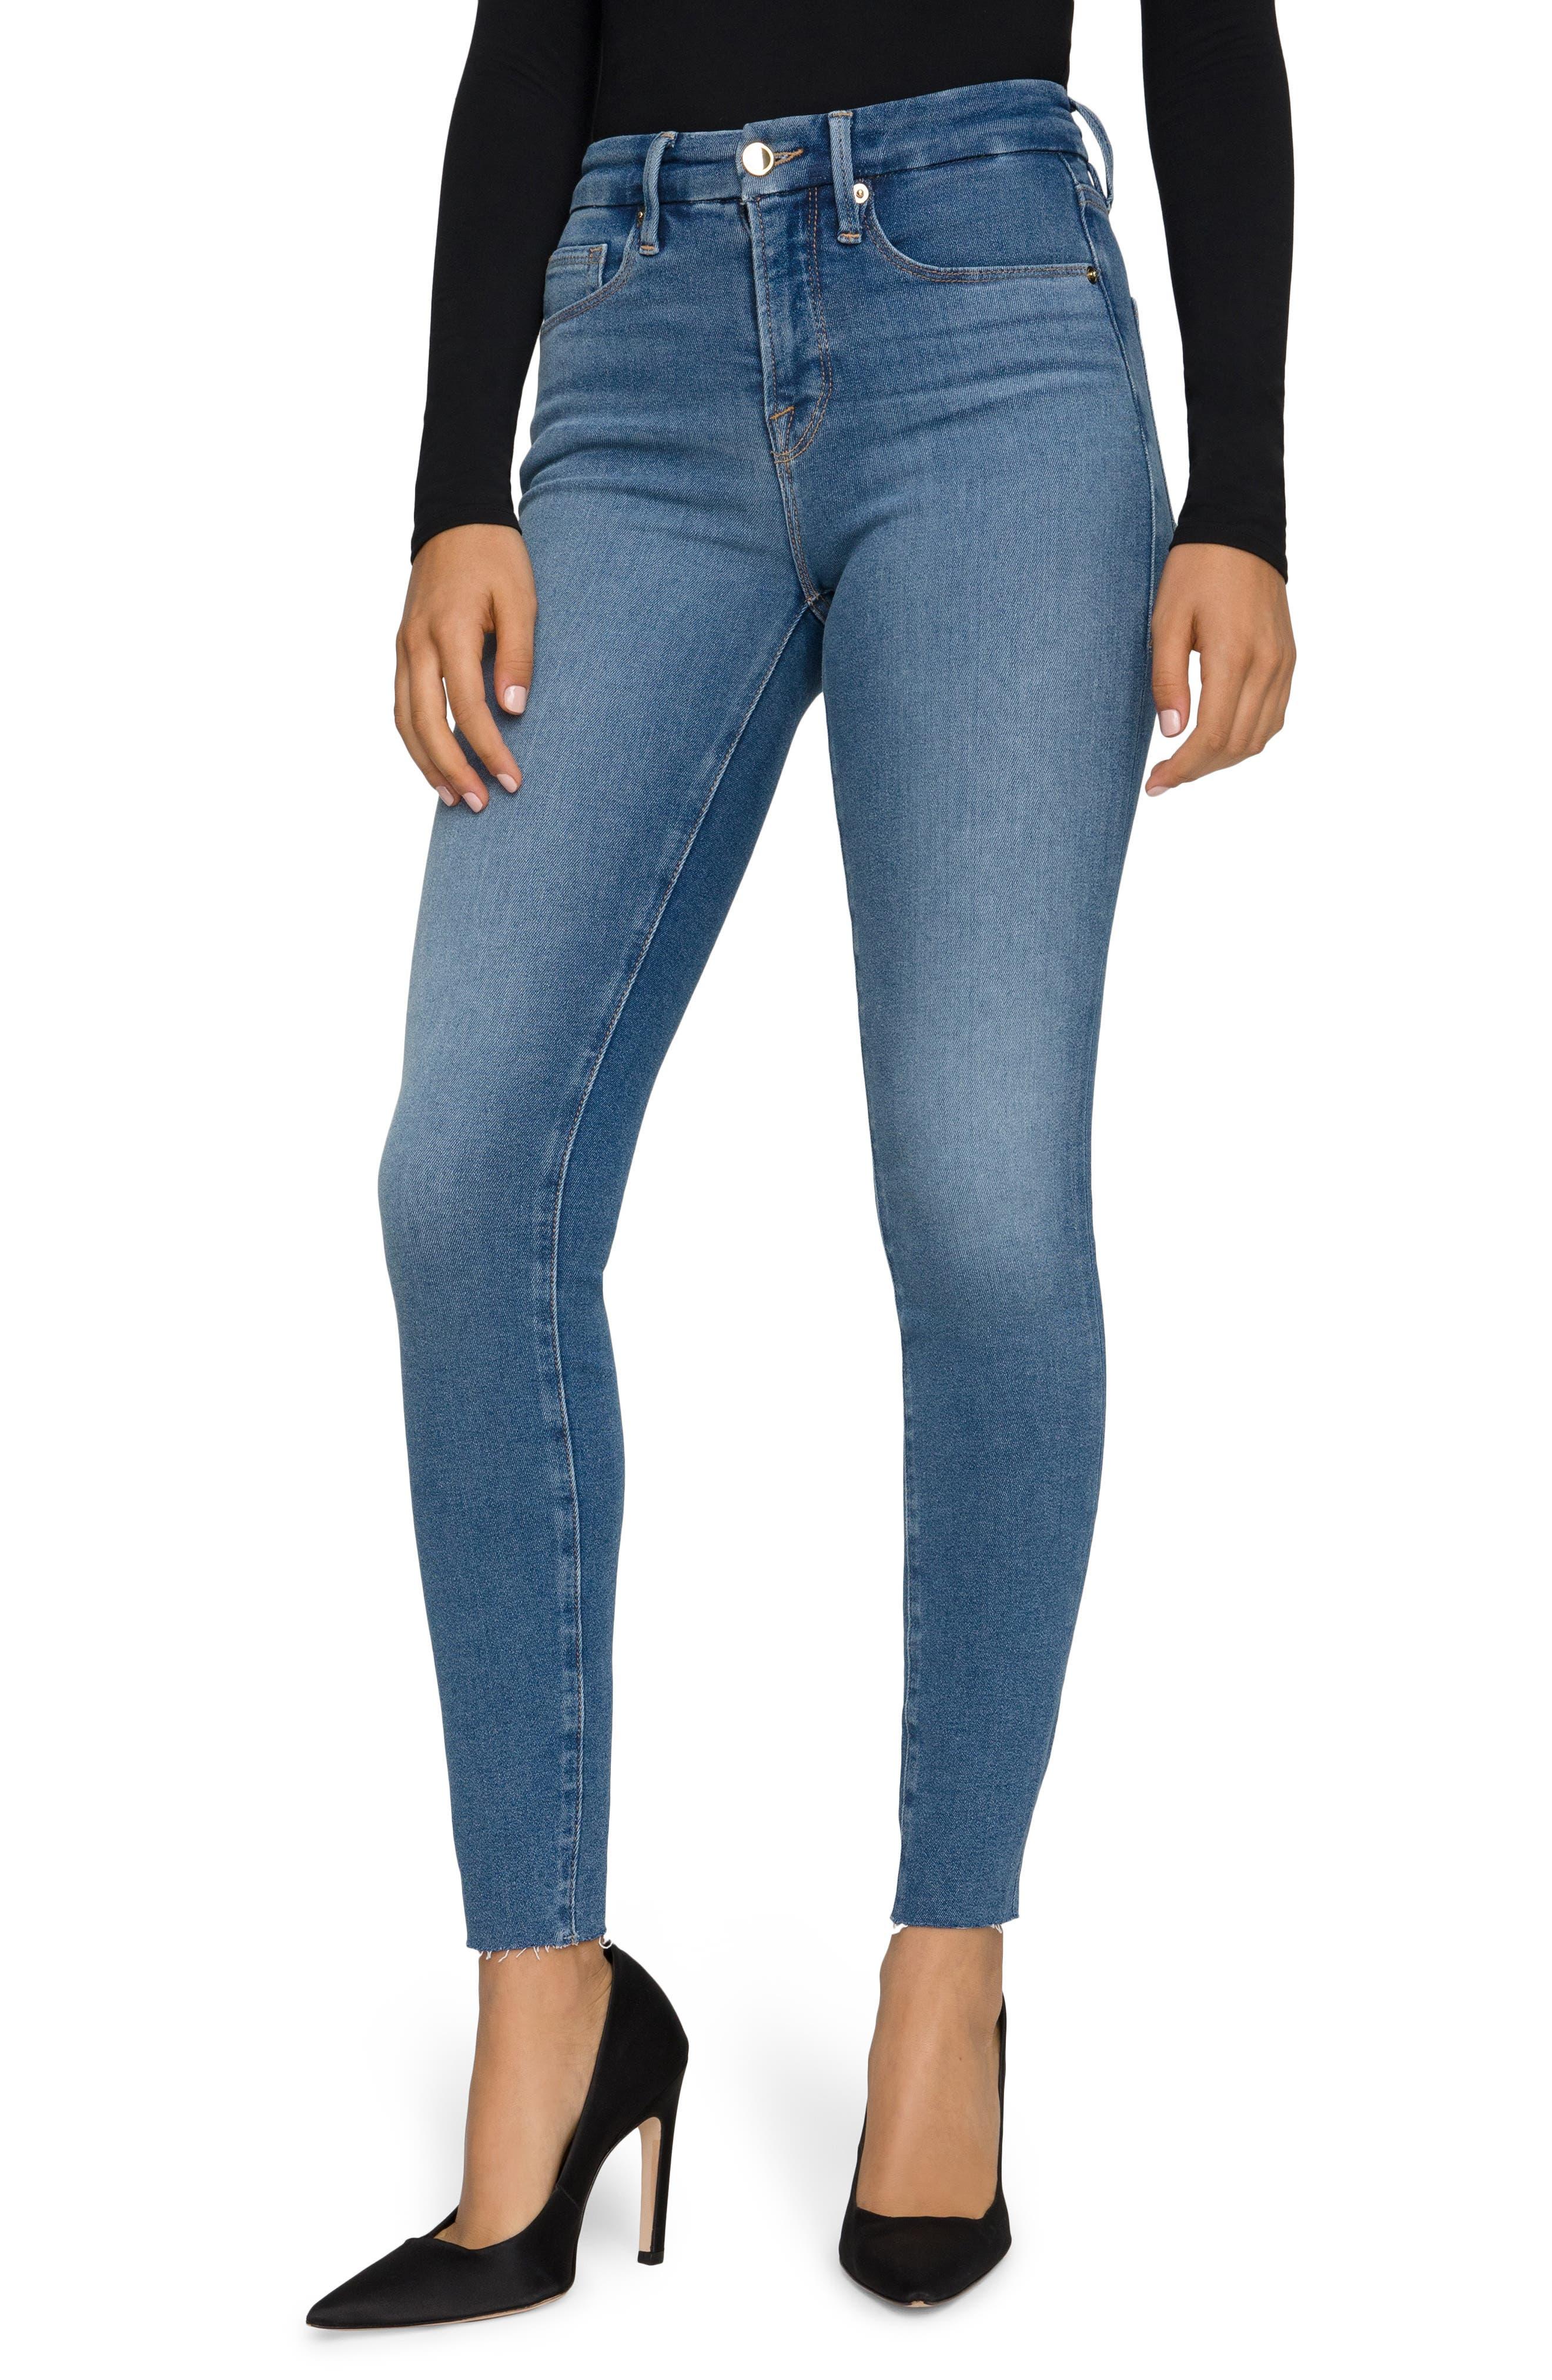 Women's Good American Good Legs Skinny Jeans